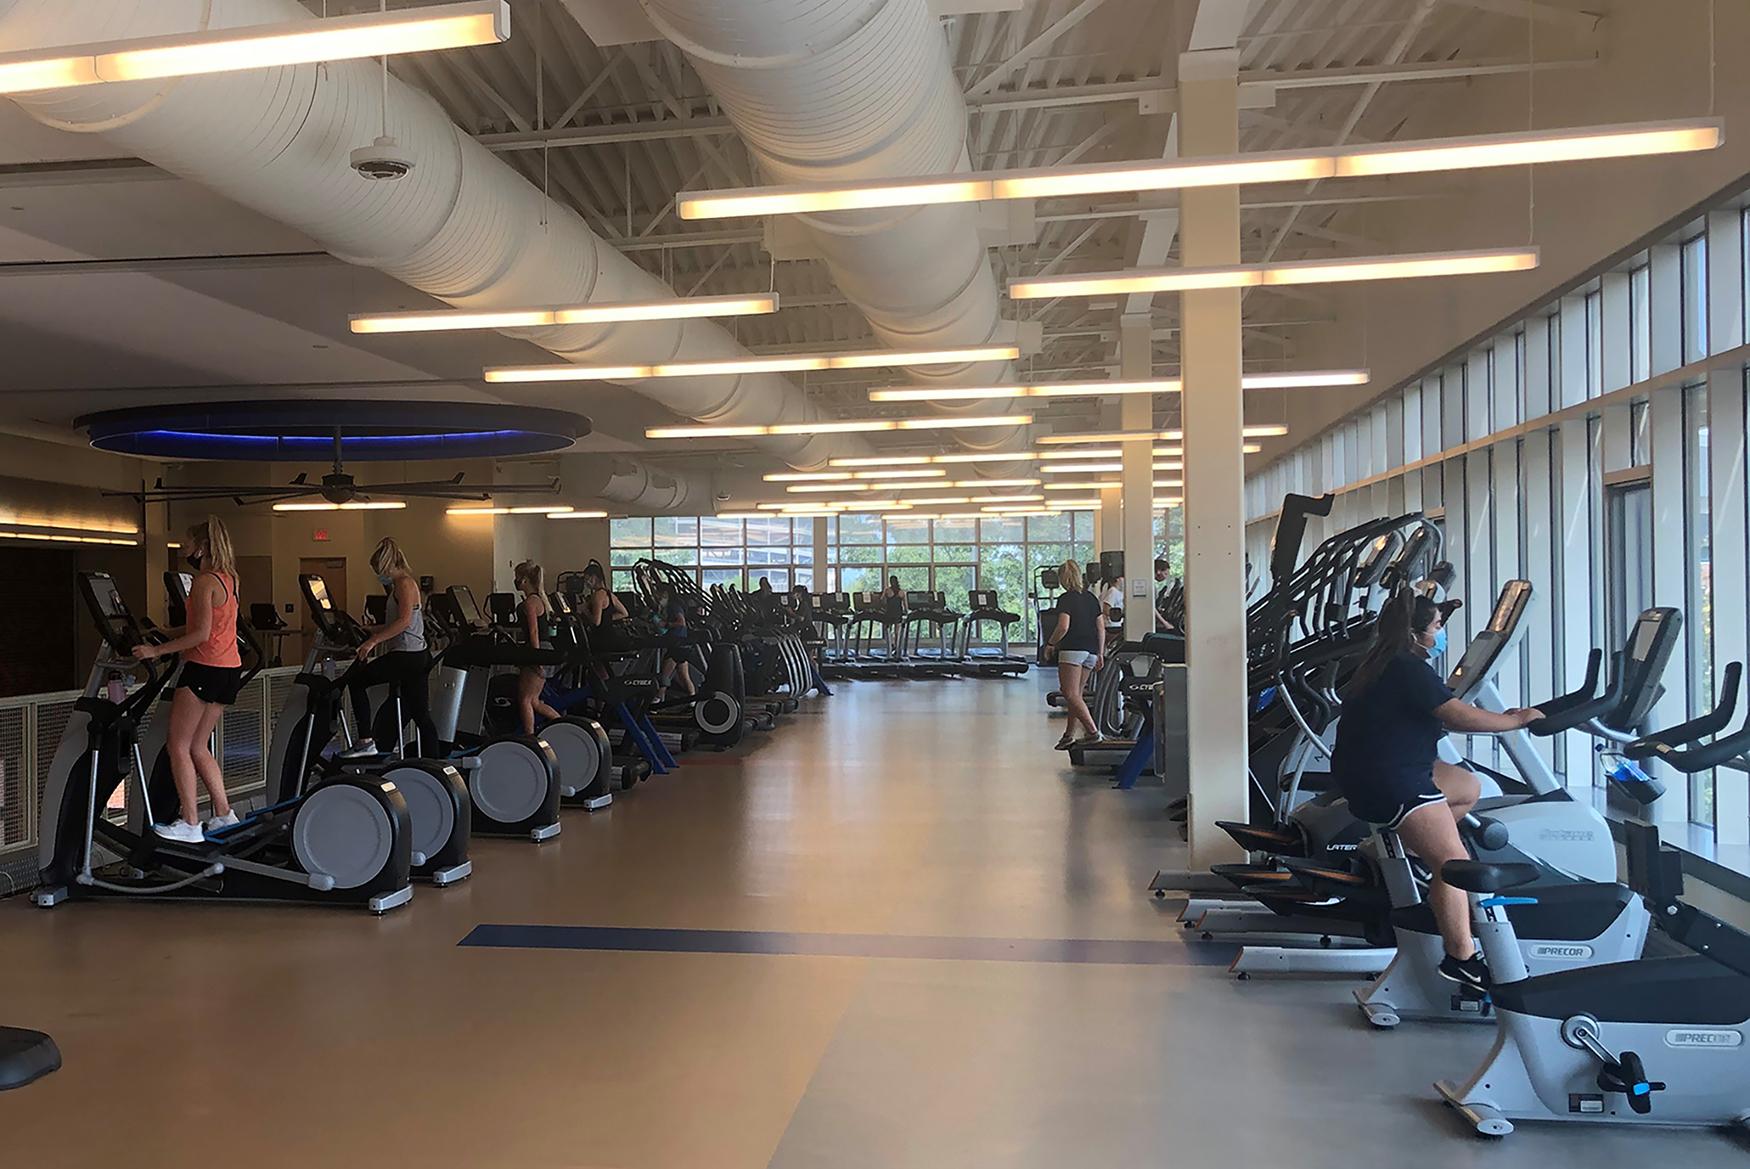 Penn State Campus Recreation